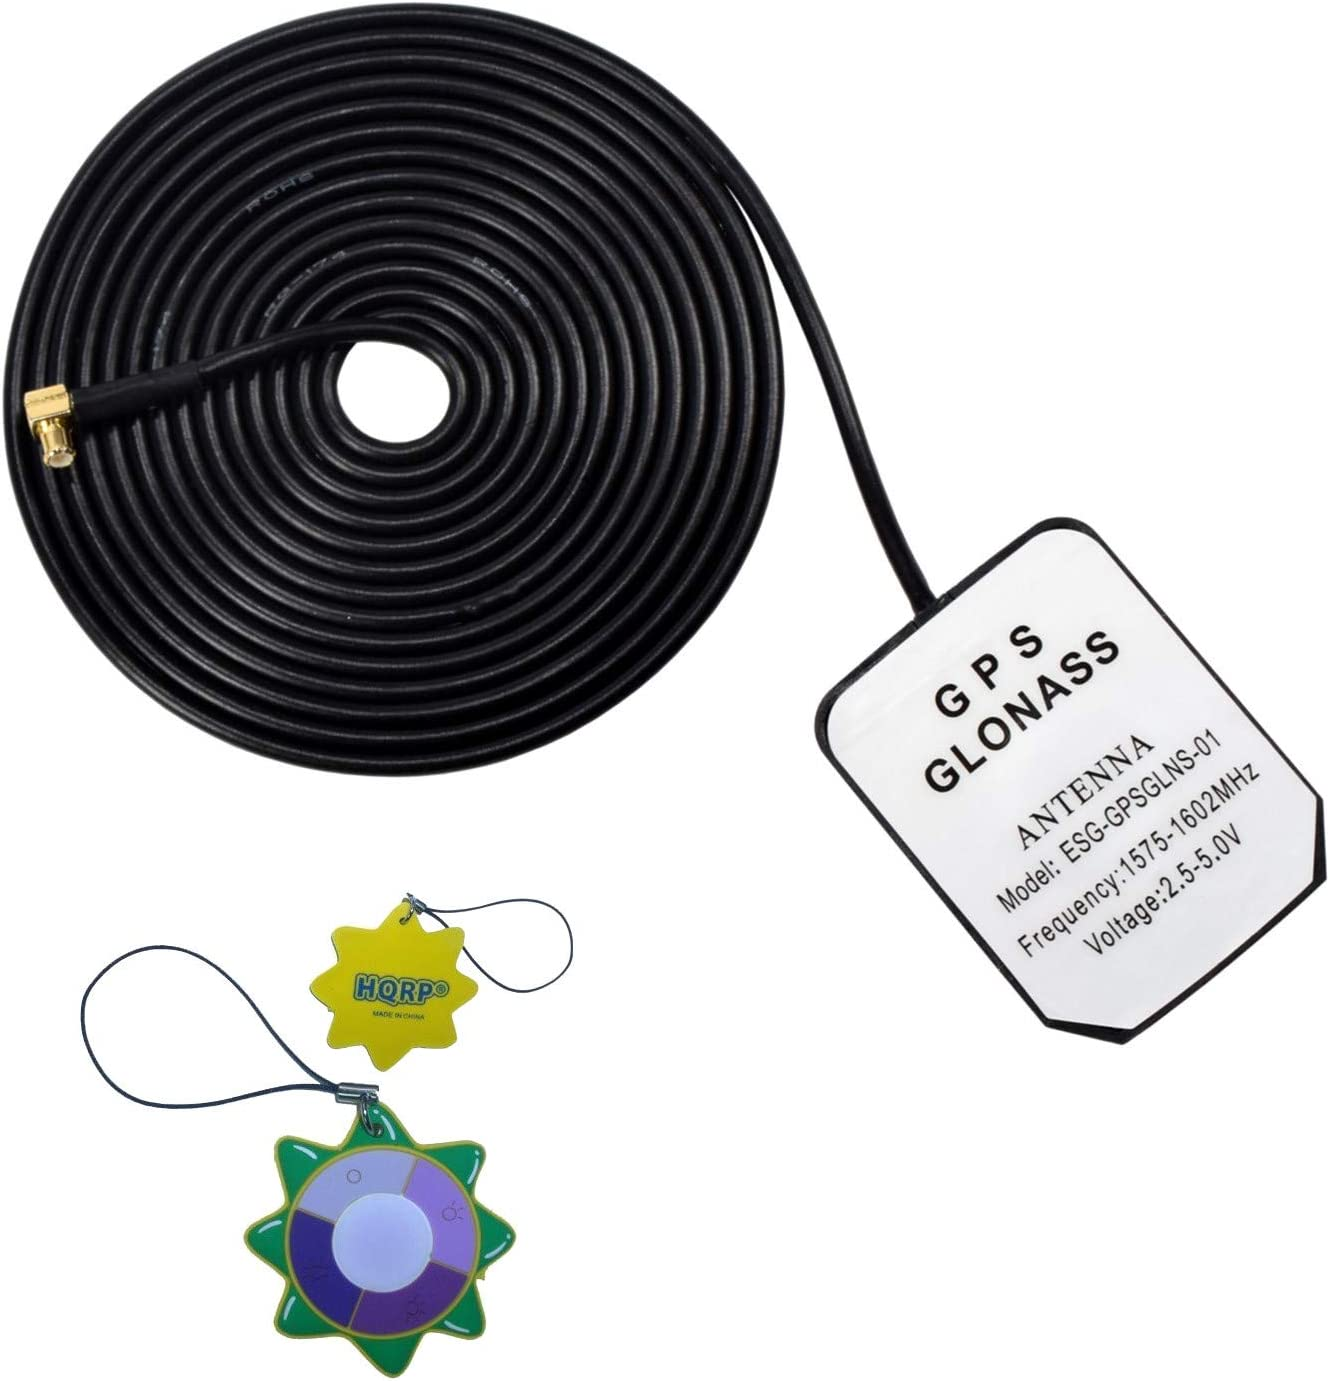 HQRP Antena externa GPS amplificada 1575.42 MHz de montaje magnético para GPSMAP 96 C (010–00384–00) / GPSMAP 60 CSx Navegador GPS de mano (010–00422–00)/GPSMAP 60 Cx GPS + HQRP medidor del sol